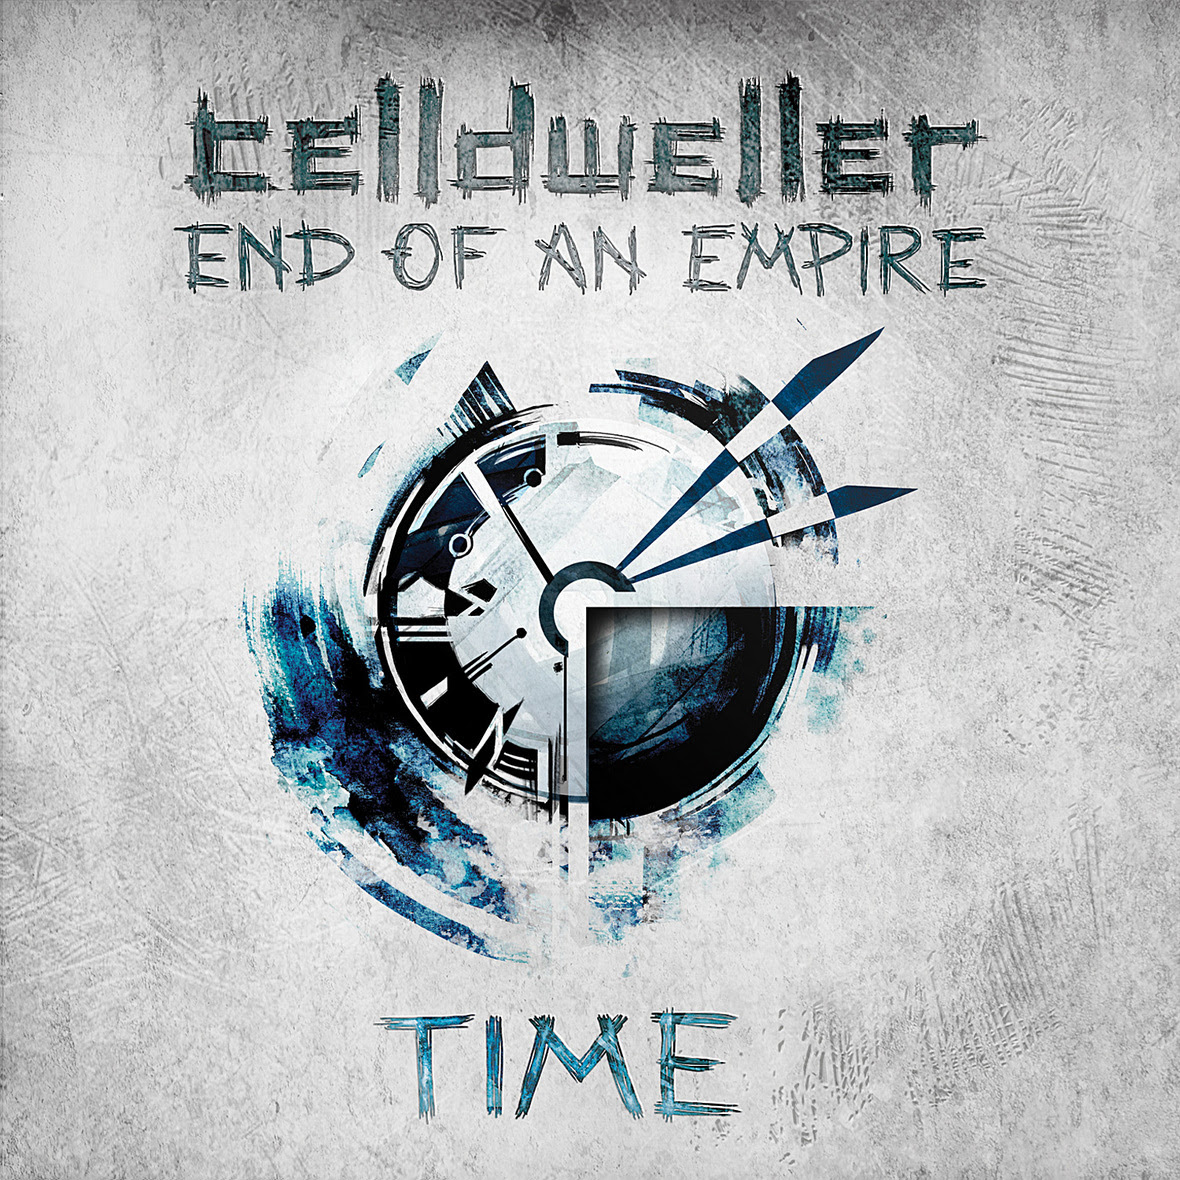 Celldweller End of an Empire  Chapter 01 Cover